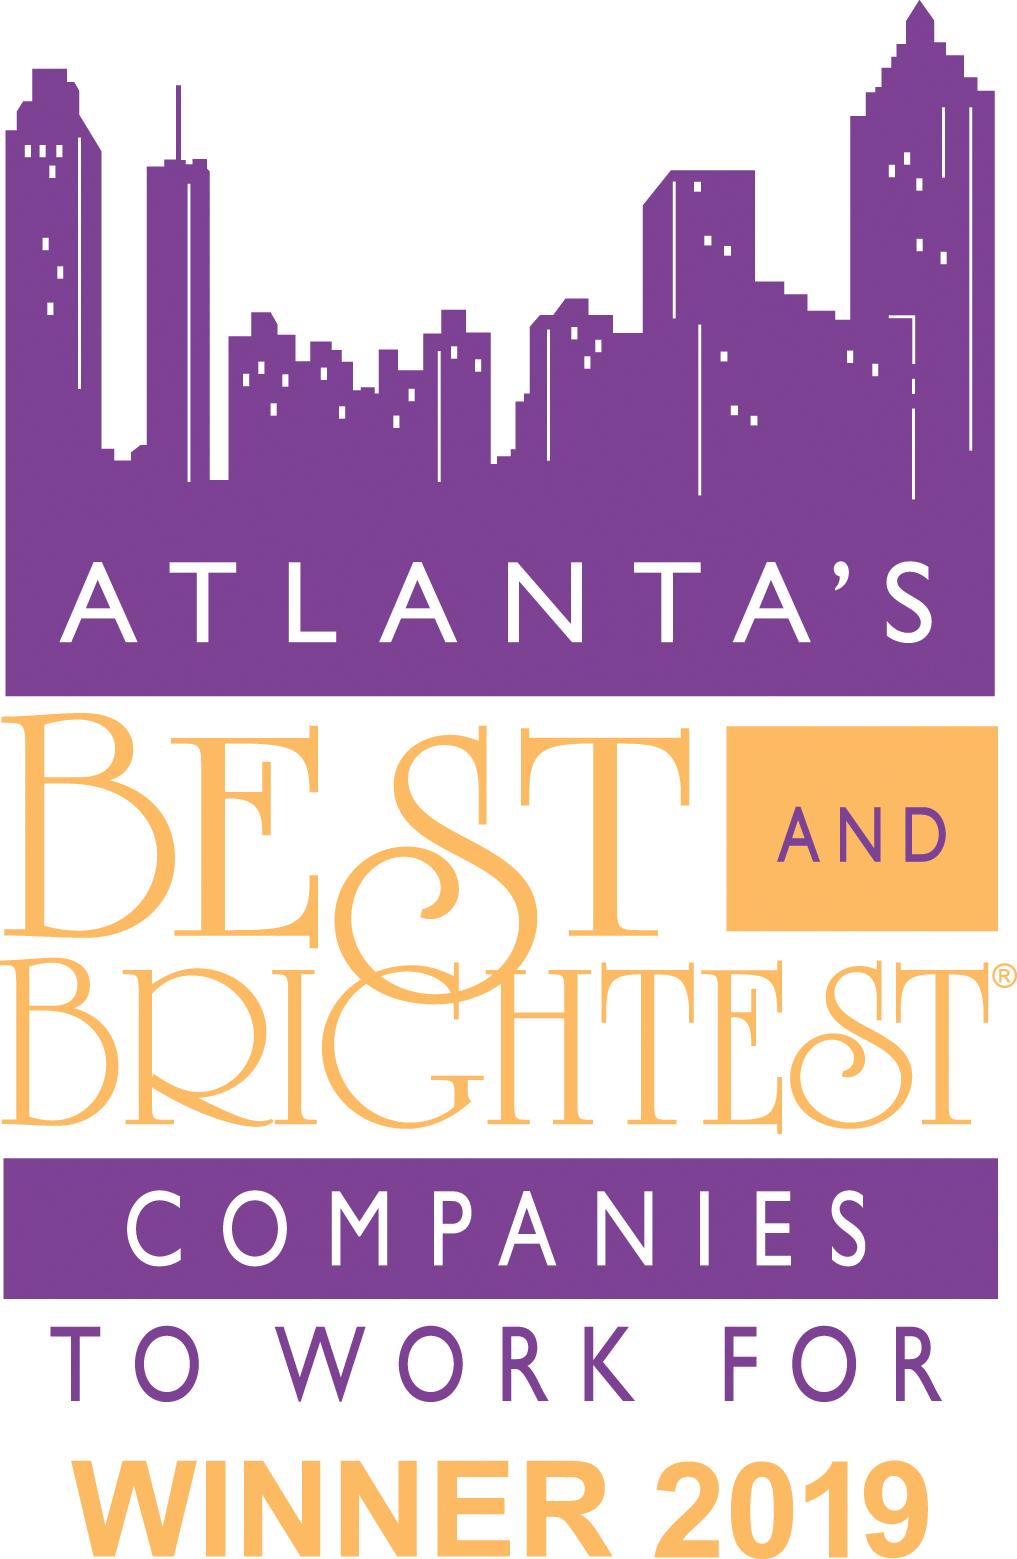 AtlantaBBlogoWin19_RGB.jpg